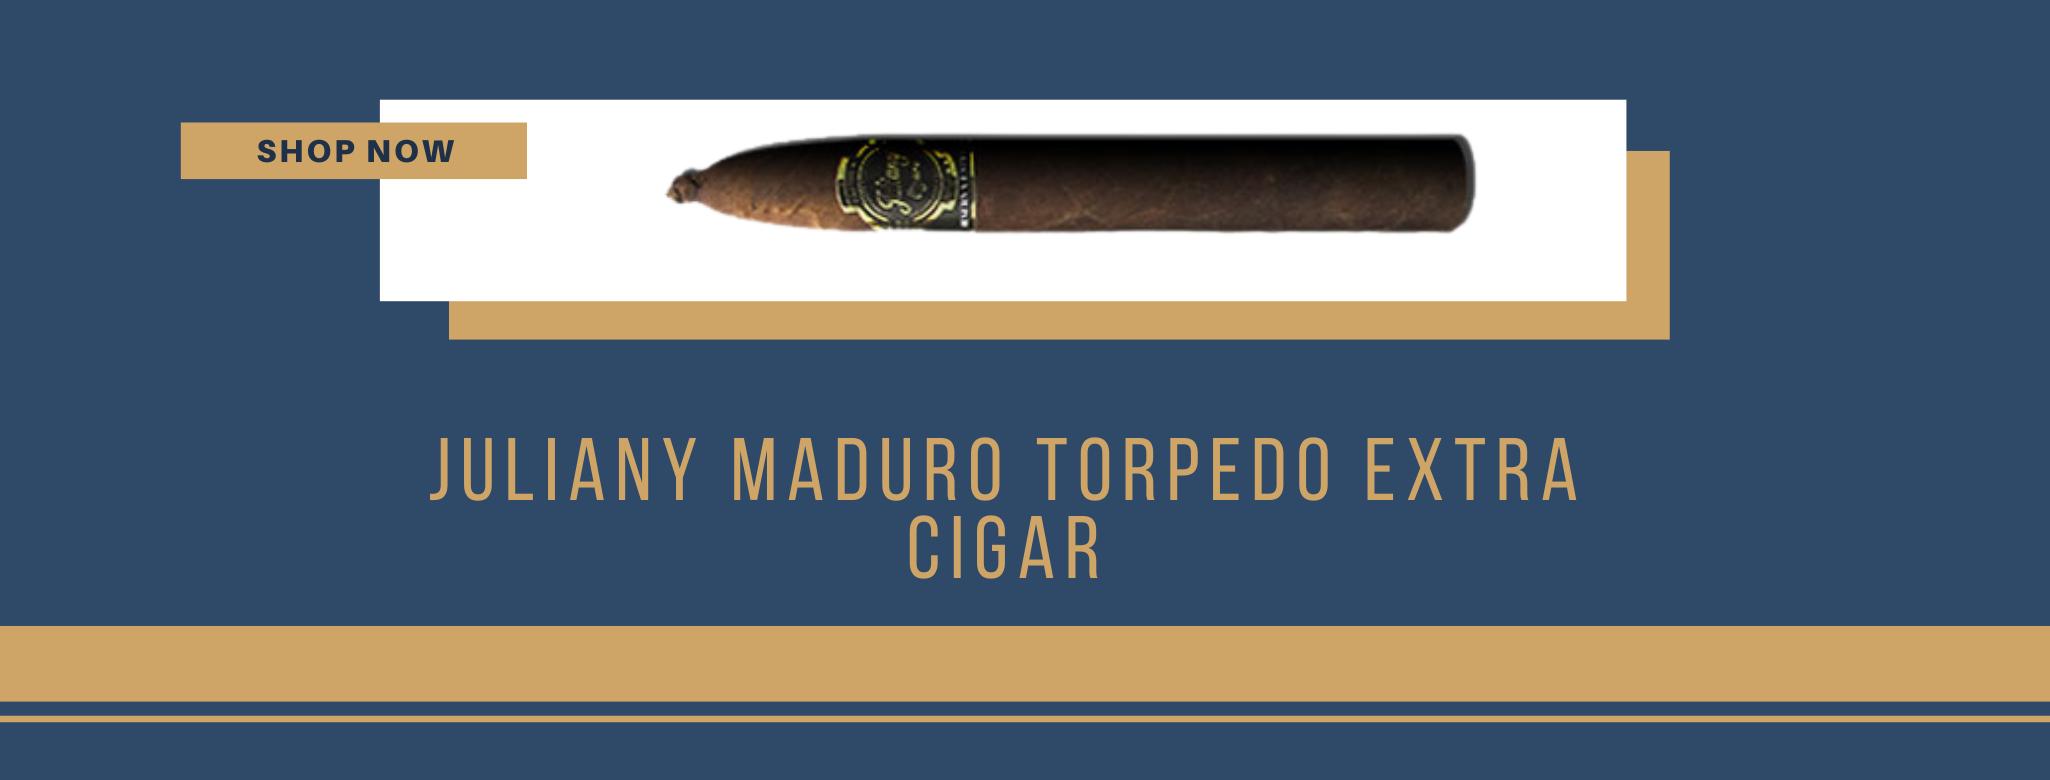 Buy Juliany Maduro Torpedo Extra Cigar online